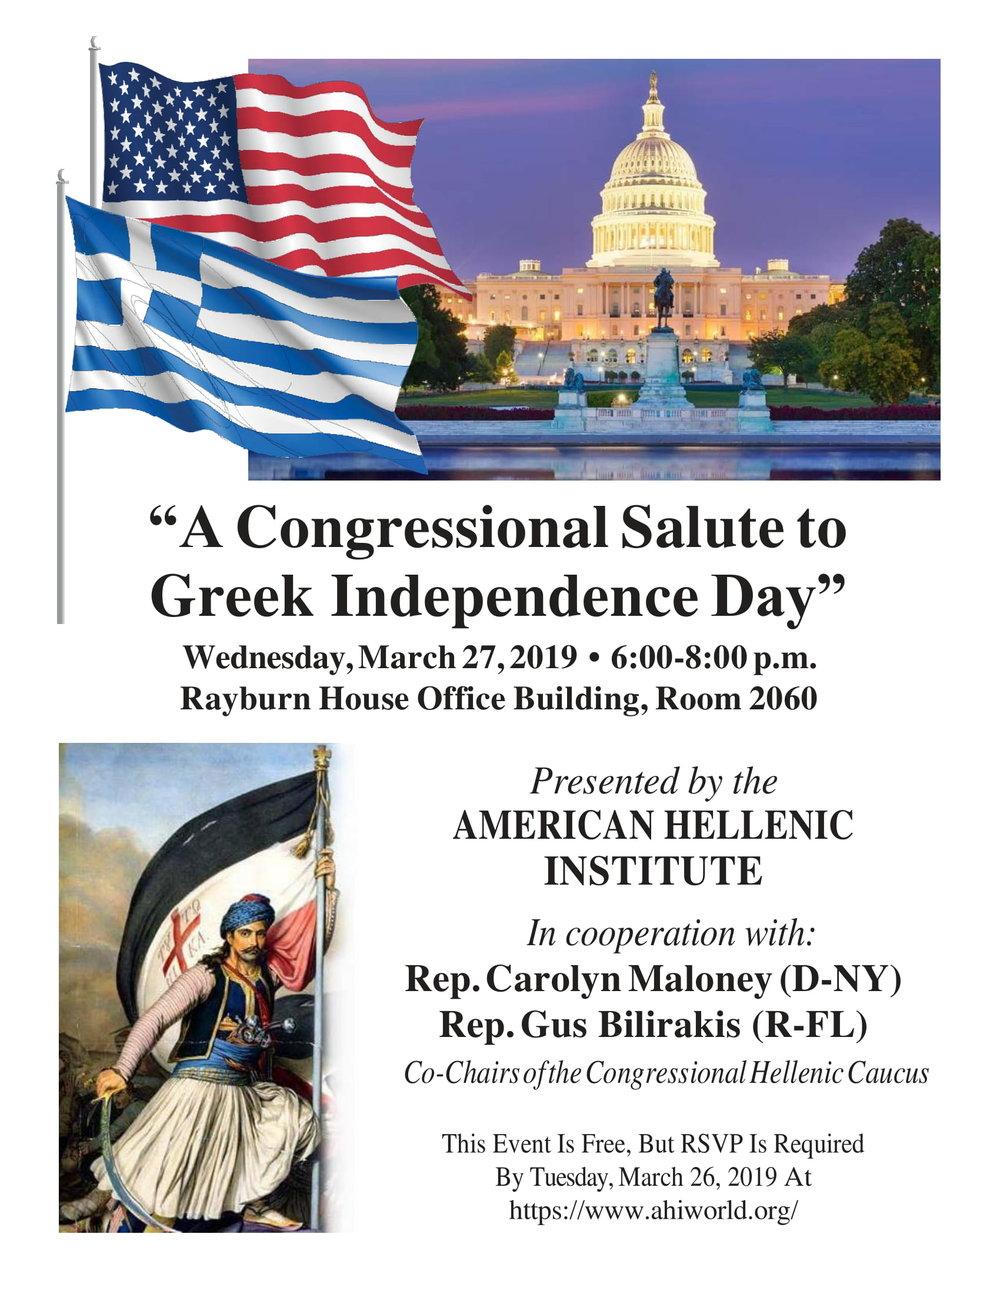 AHI Congressional_Greek Independence 2019 Flyer jpg-1.jpg